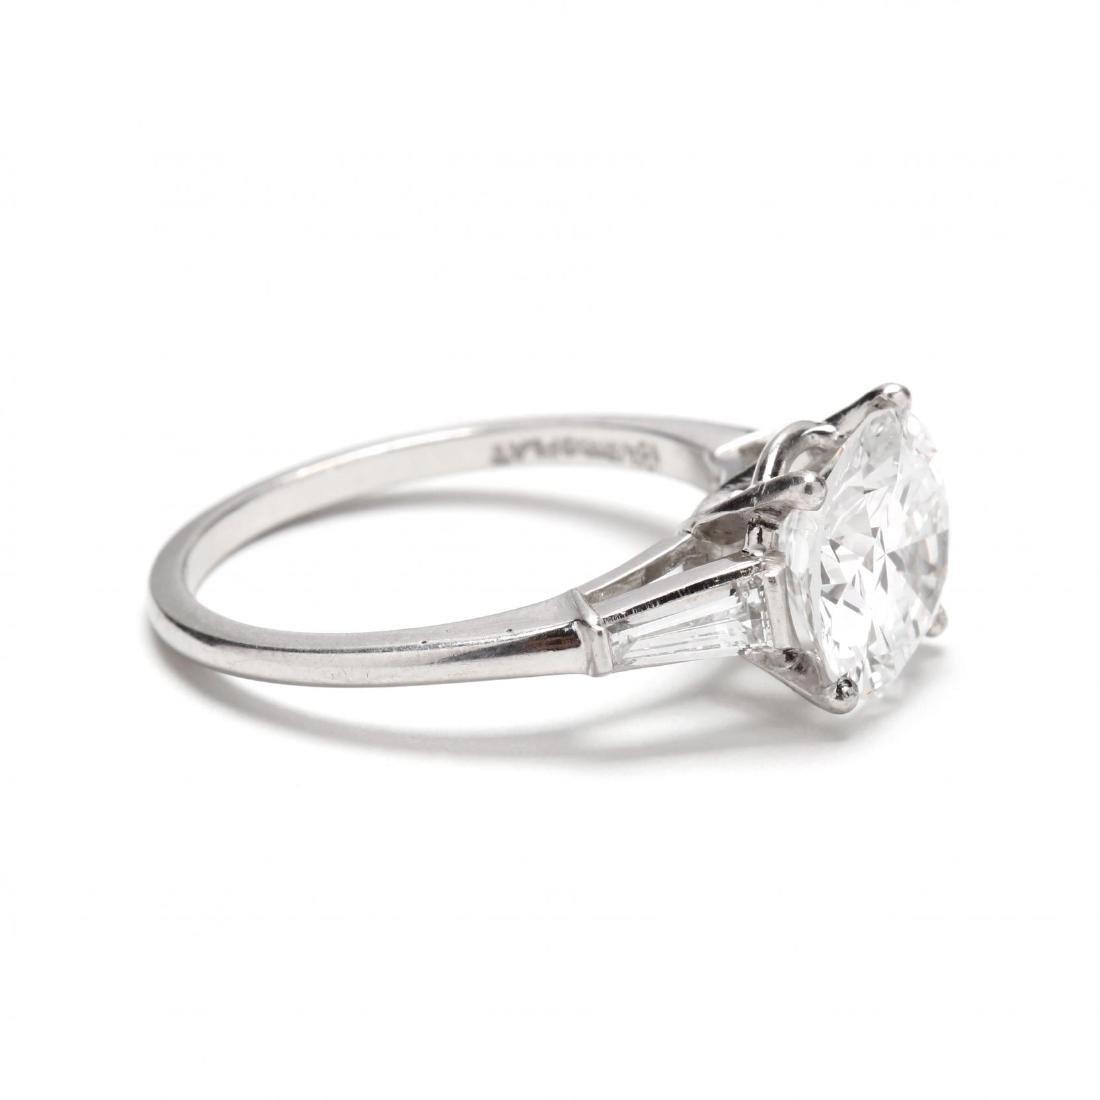 Unmounted Round Brilliant Cut Diamond with Platinum and - 5